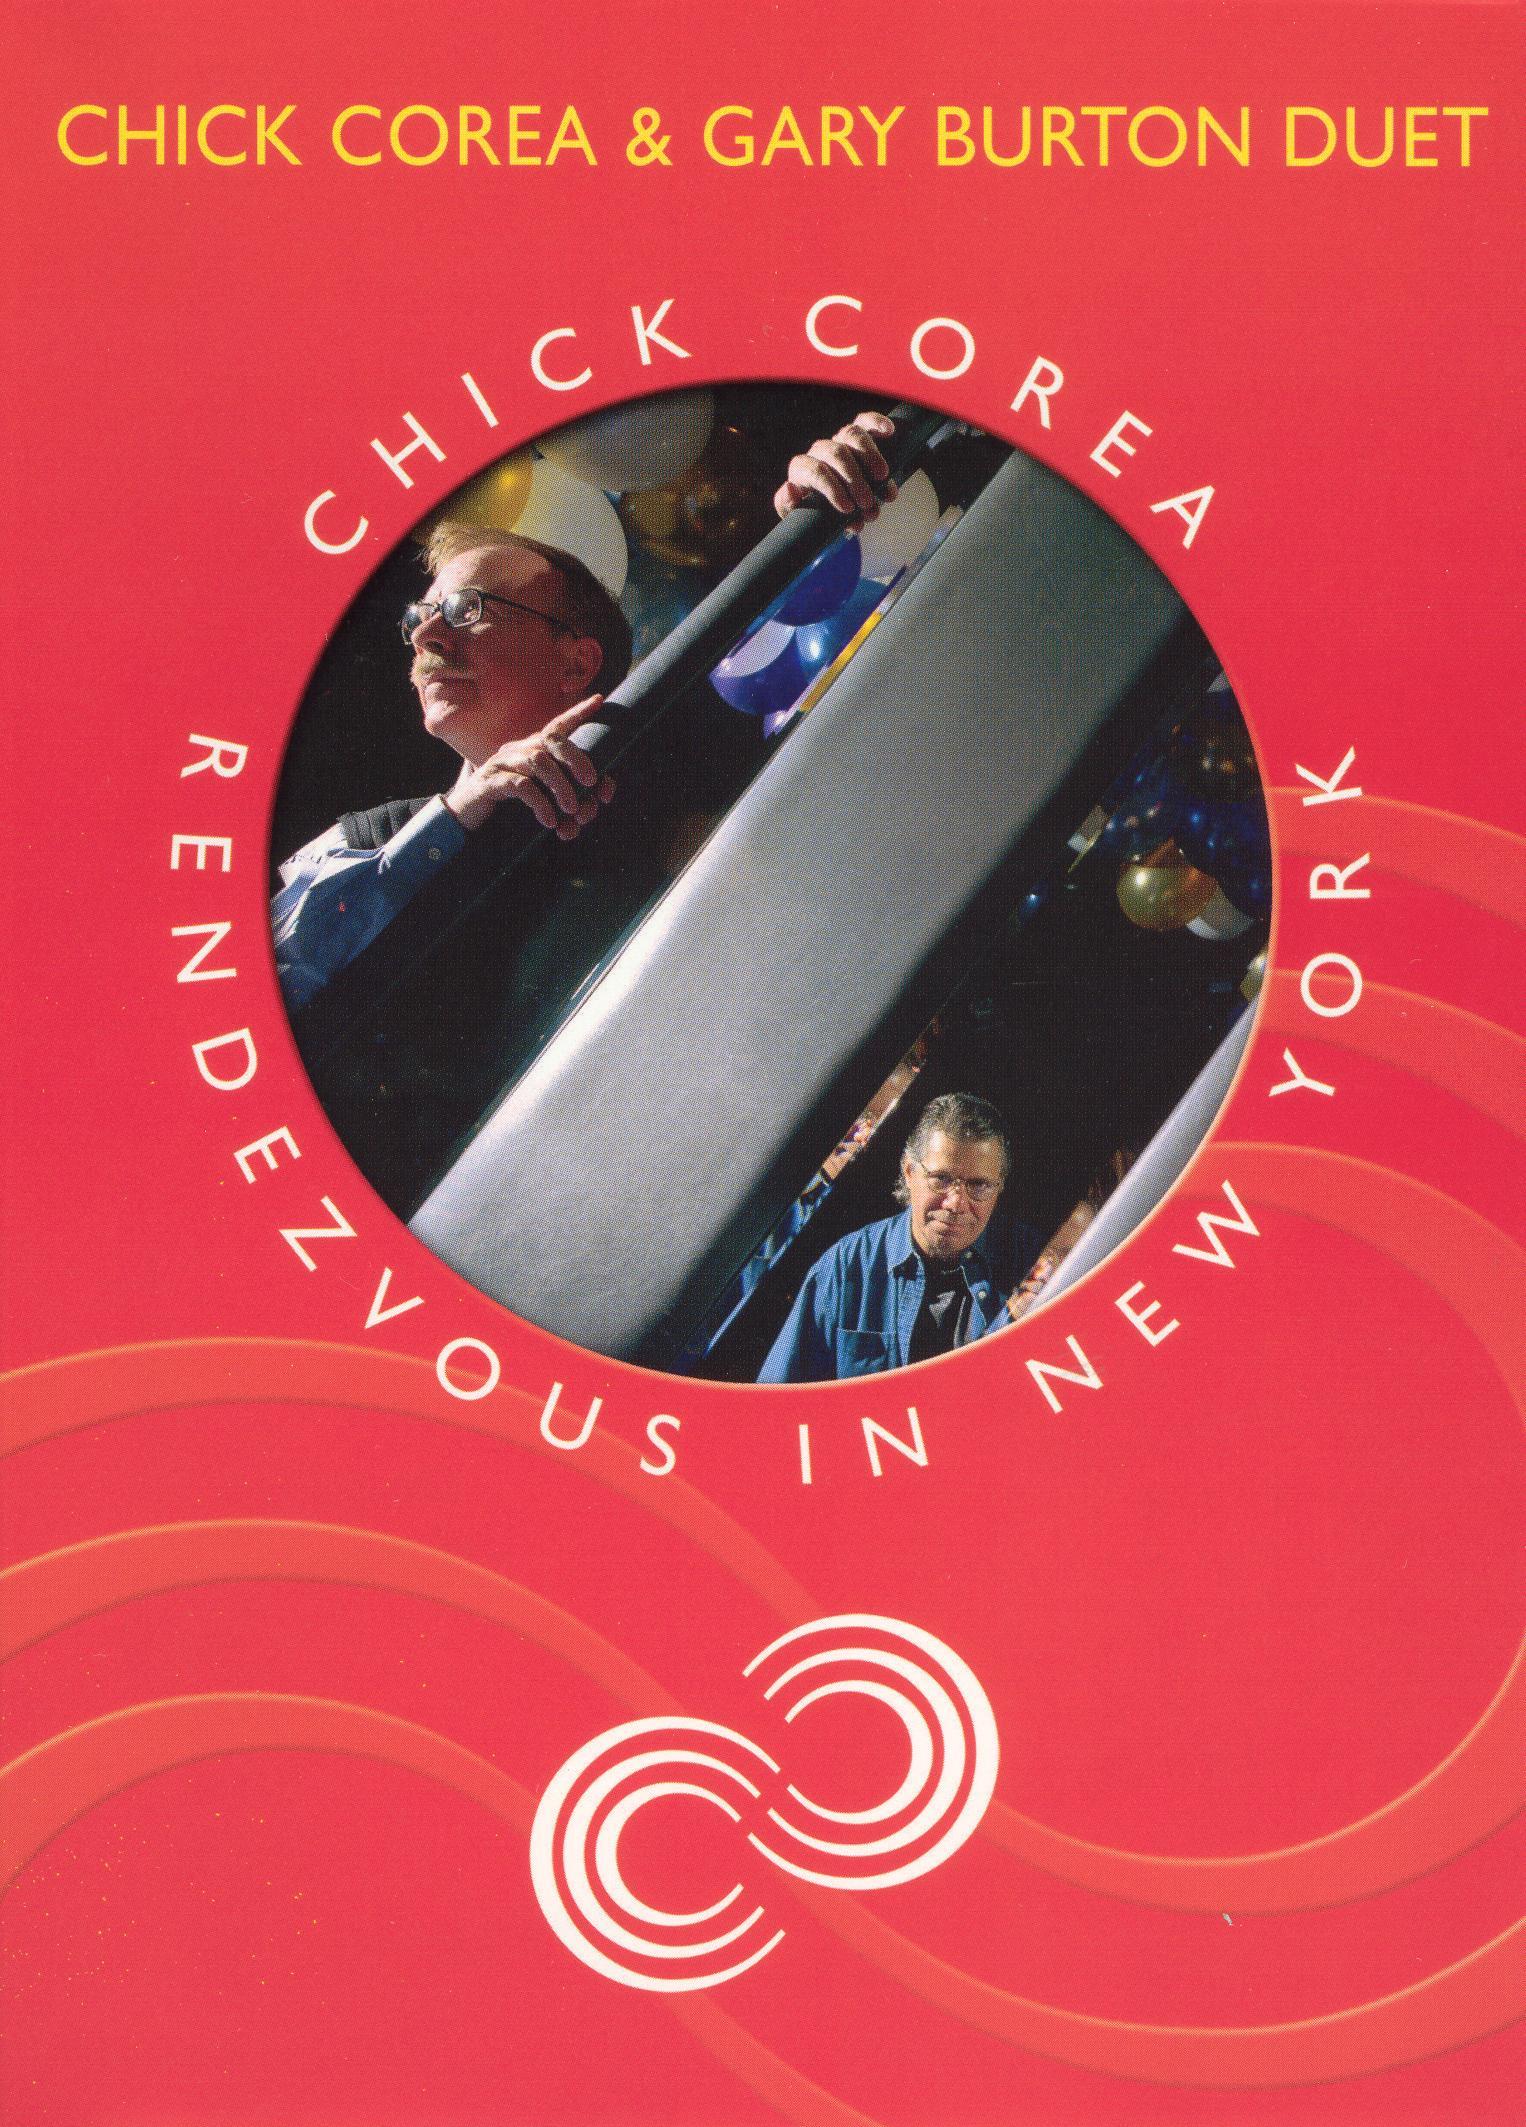 Chick Corea: Rendezvous in New York - Chick Corea & Gary Burton Duet